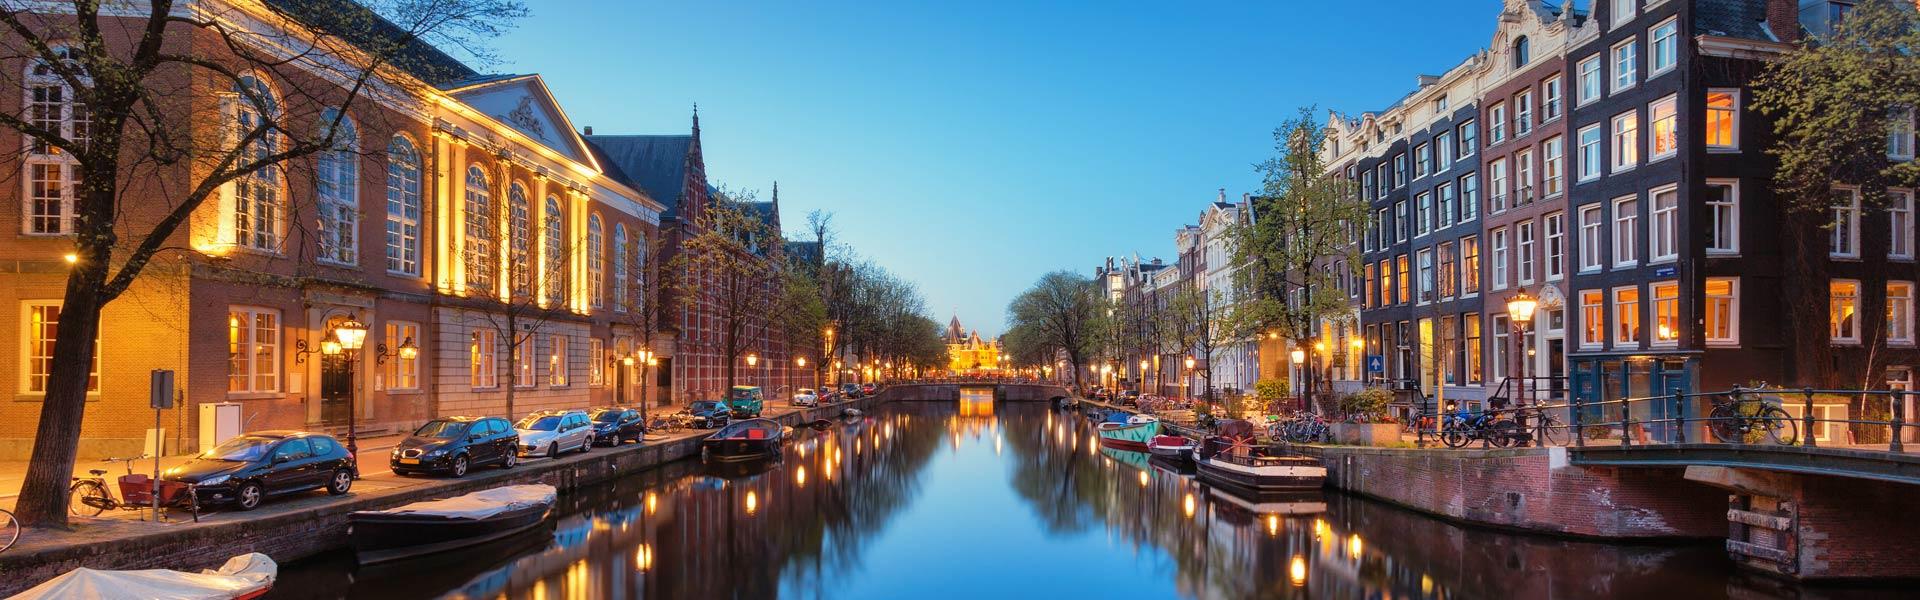 amsterdam_smaller